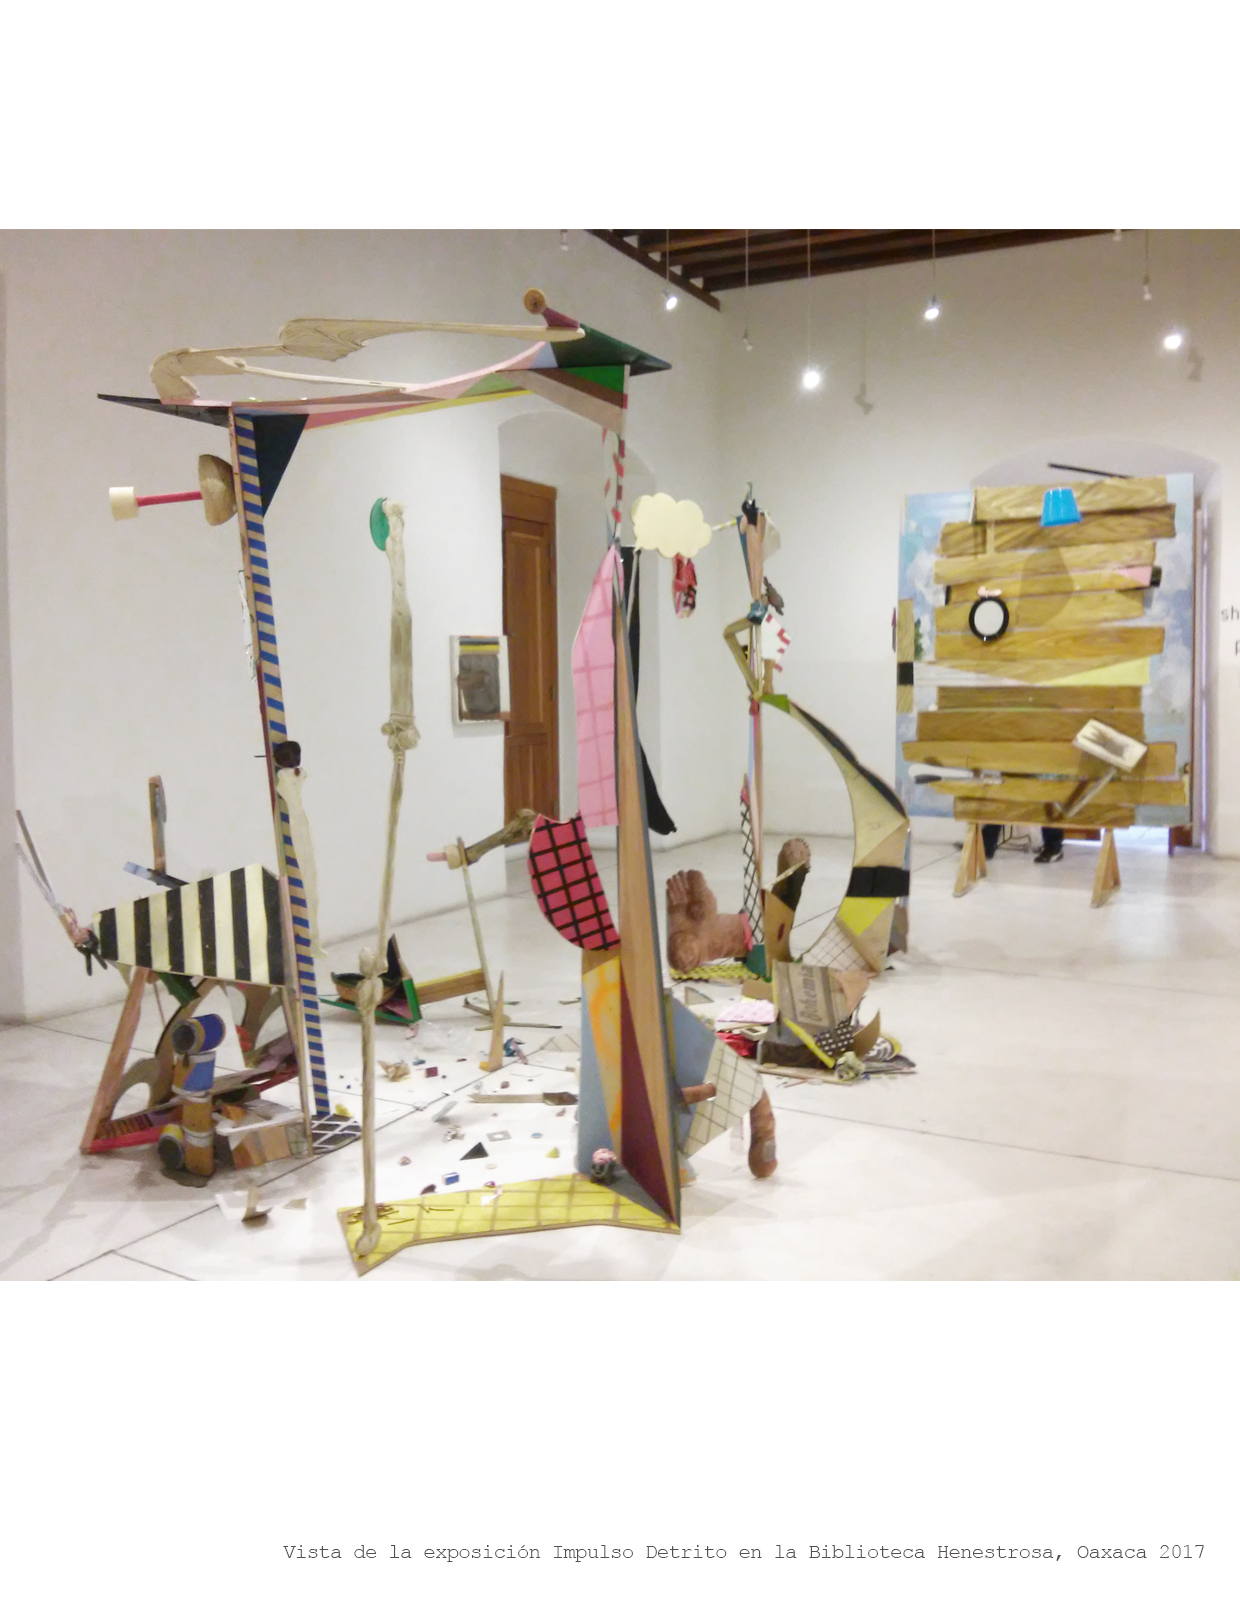 impulso detrito (2017) - Luis Hampshire